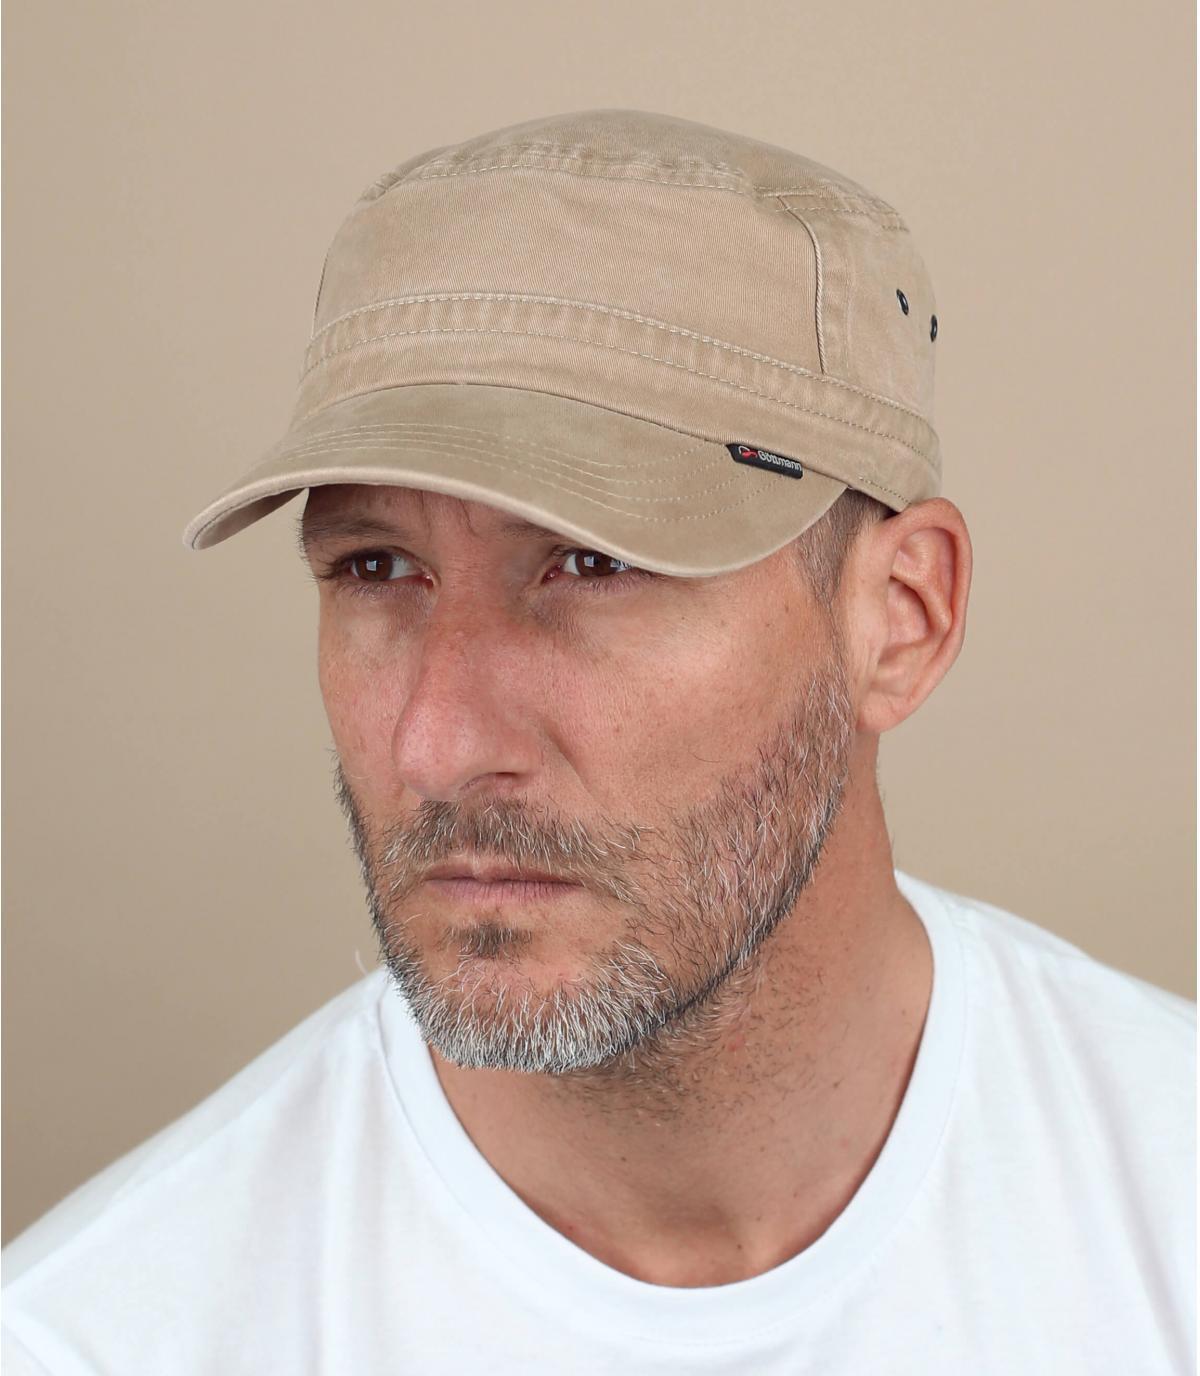 beige military hat